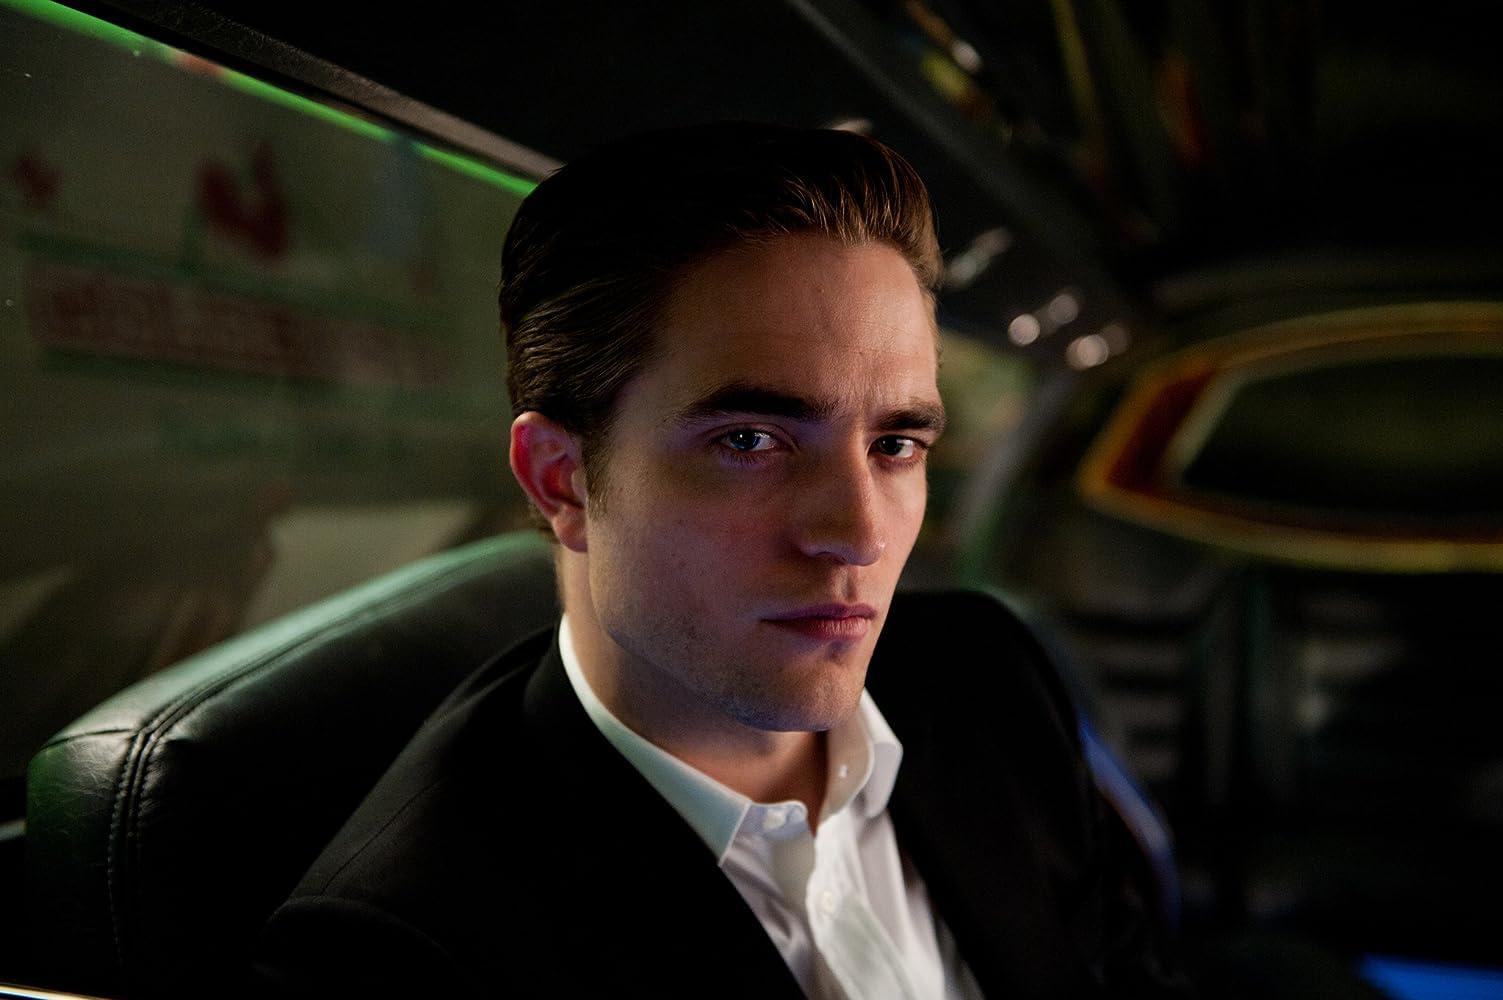 Robert Pattinson in Cosmopolis (2012)